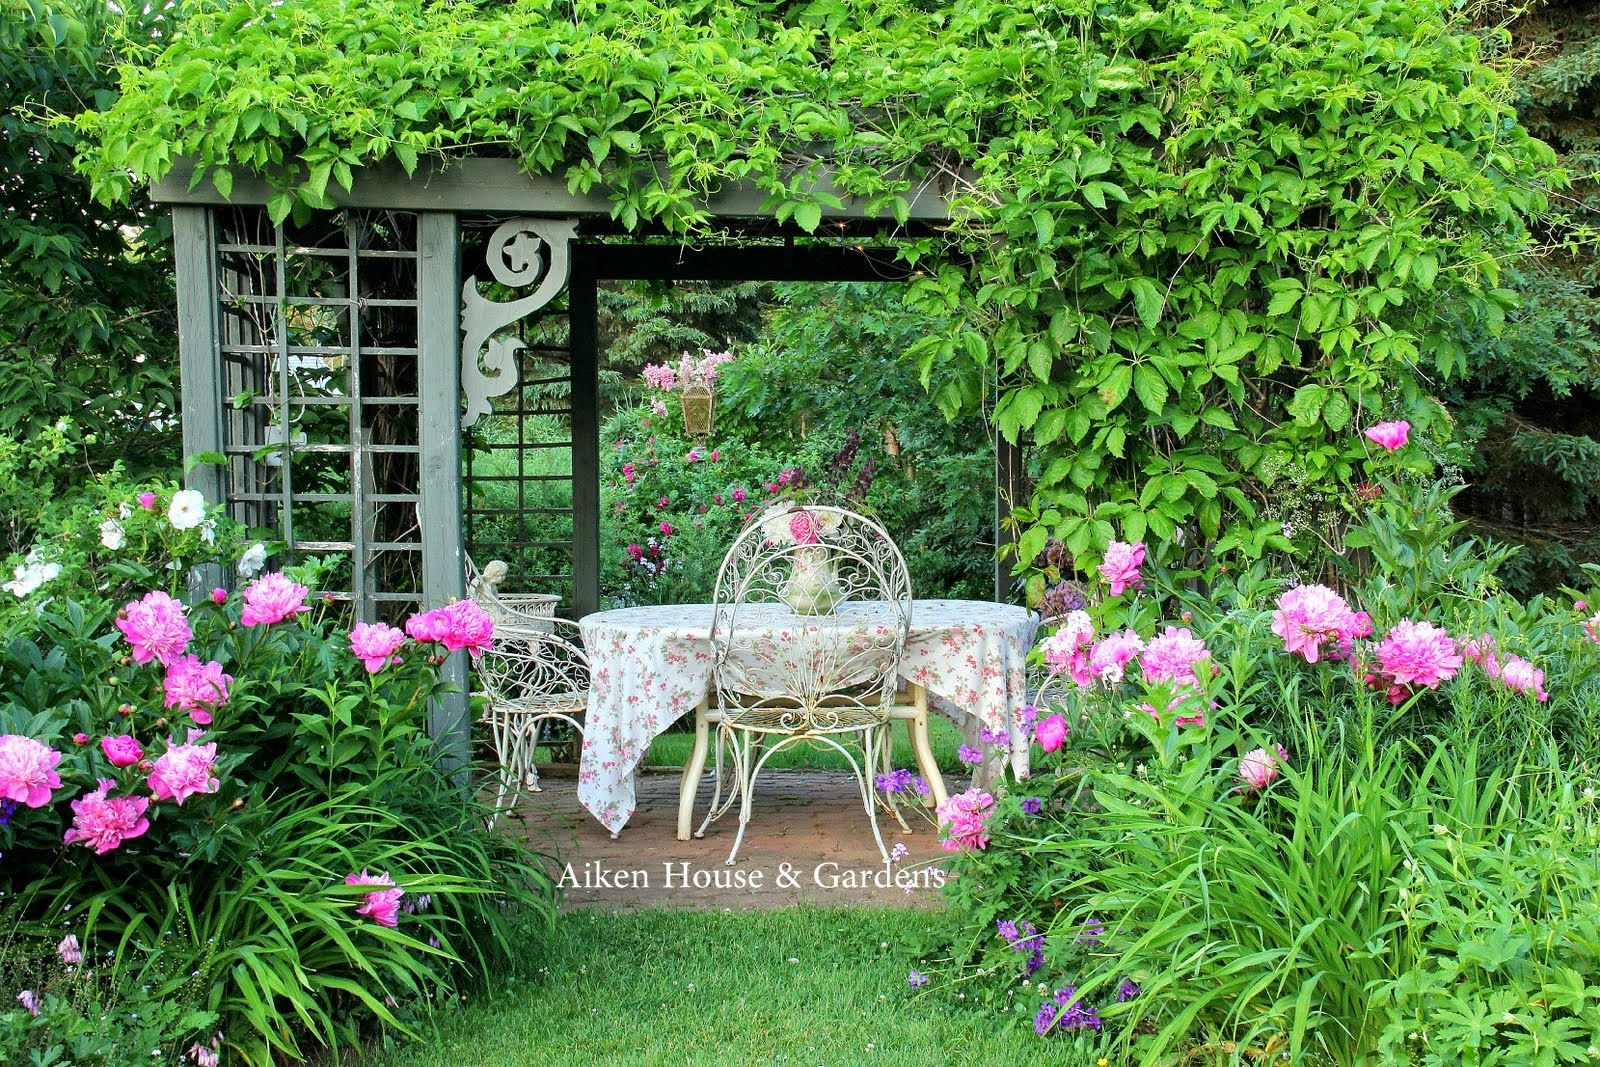 Aiken House & Gardens: In an English Country Garden | Relaxing ...